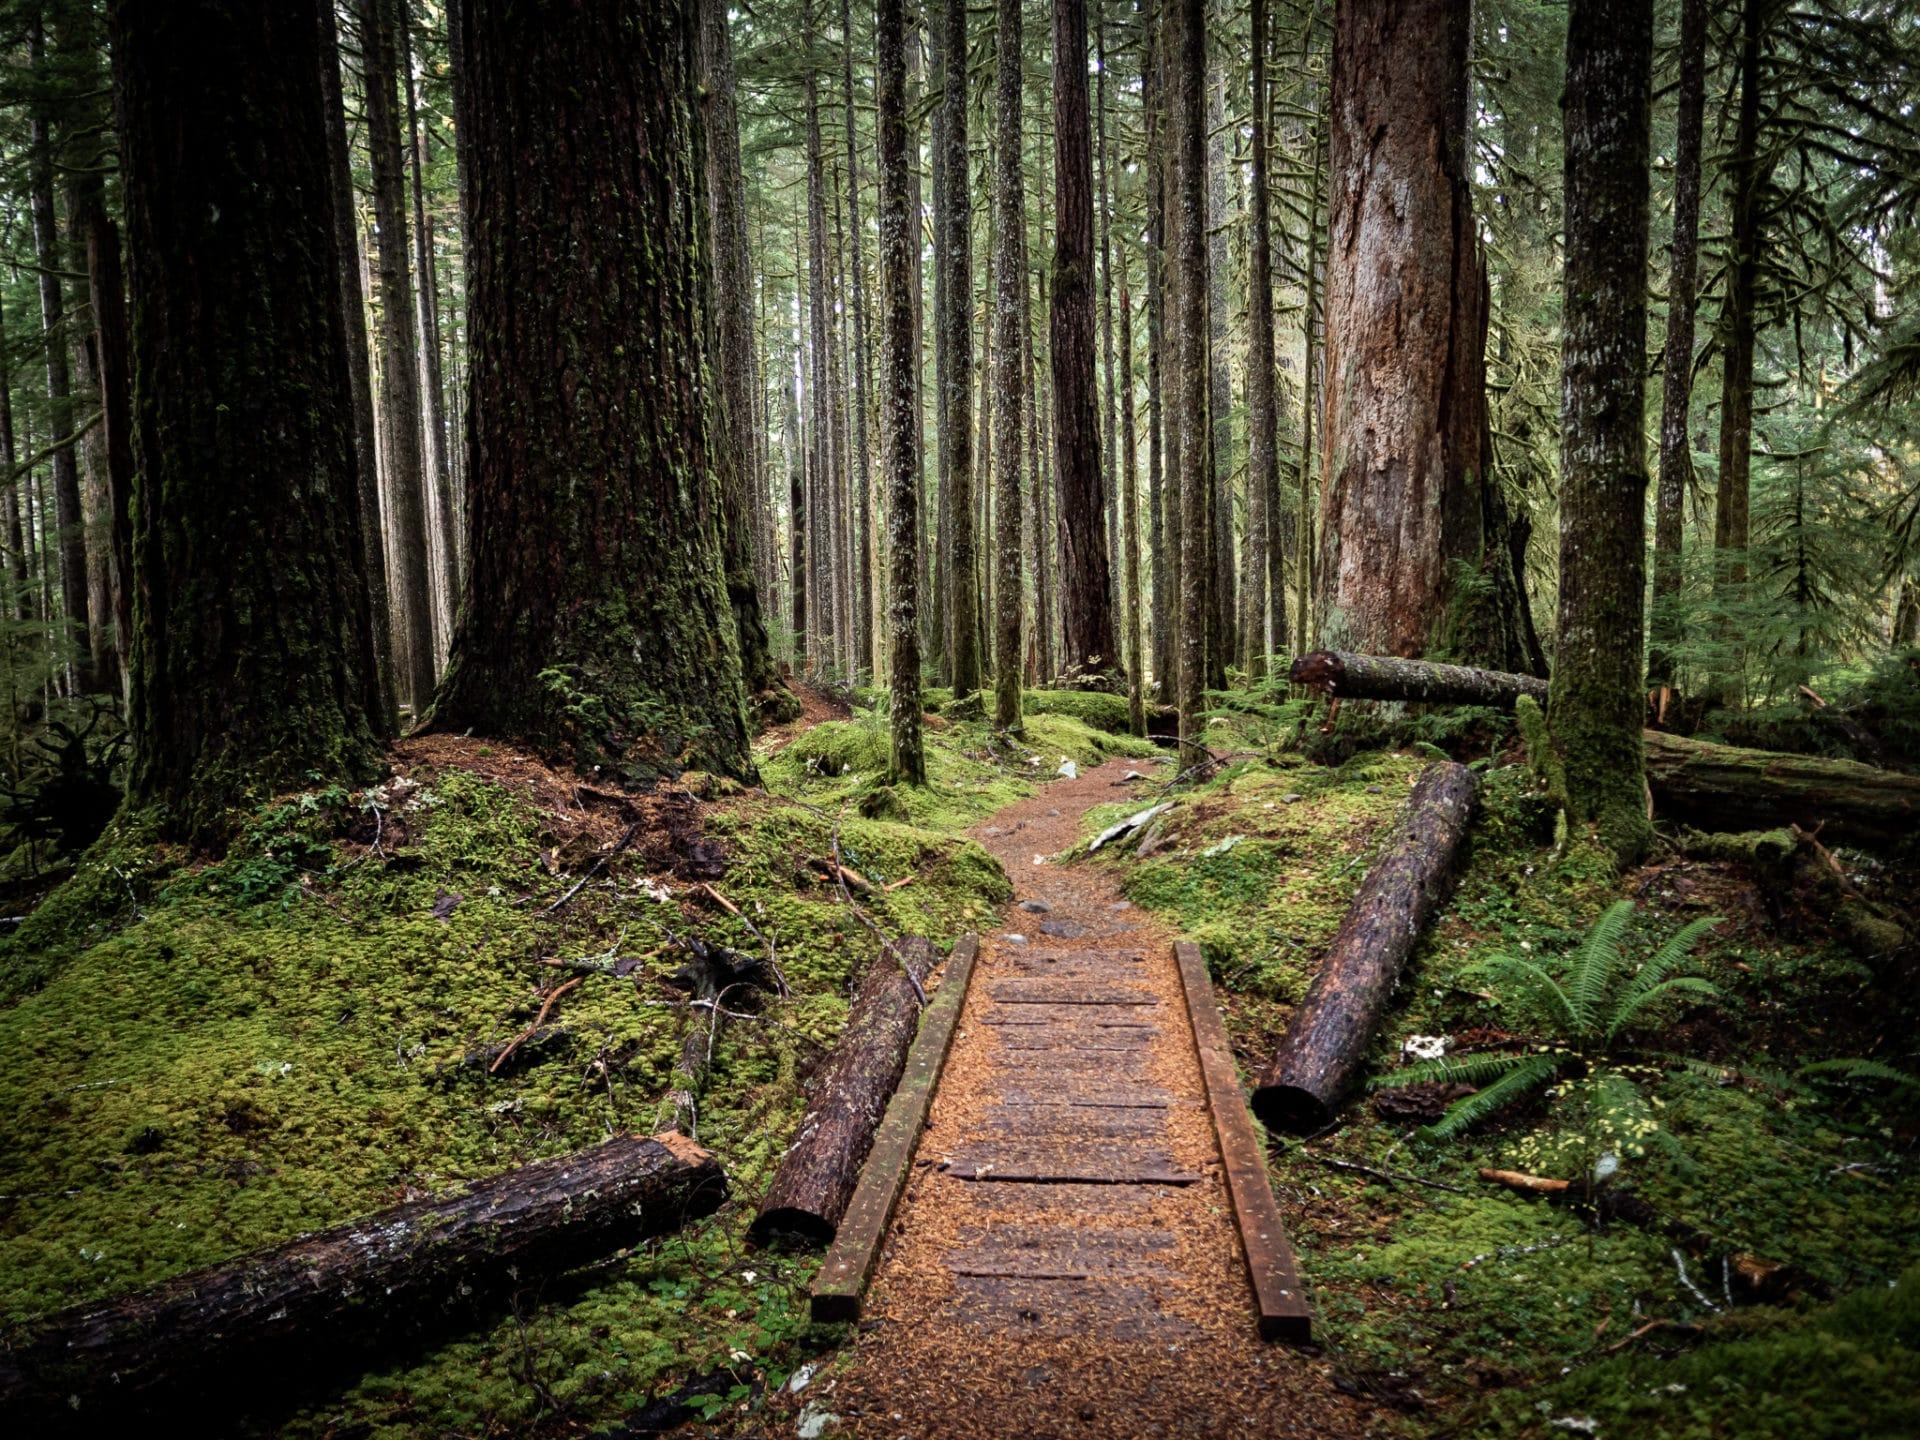 Sol-Duc-Trail-Olympic-National-Park-Tiny-Bridge